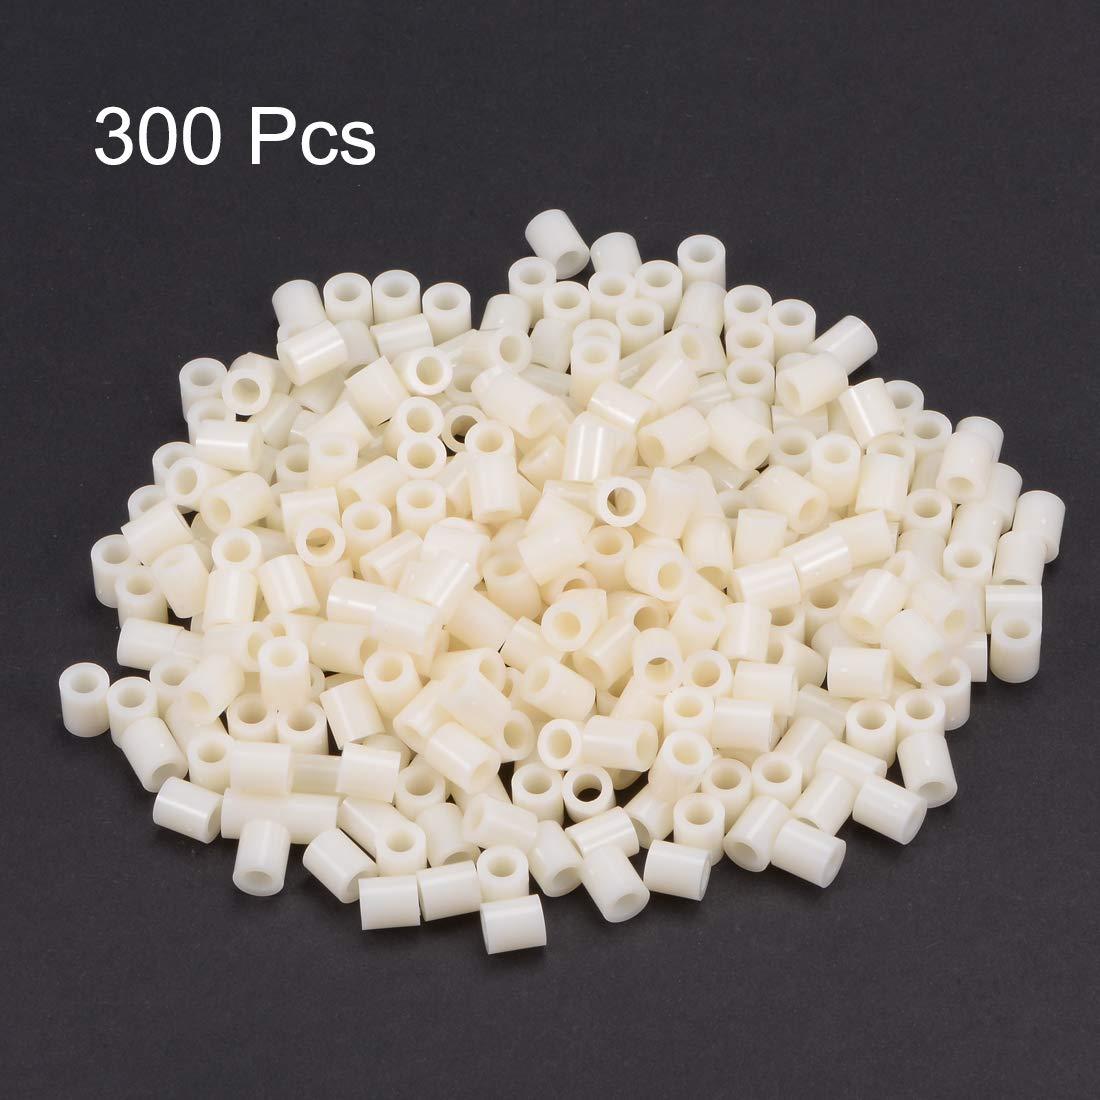 uxcell 150pcs Nylon Round Straight Pillar Insulating Tube PCB Spacer Standoffs 4x7x8mm